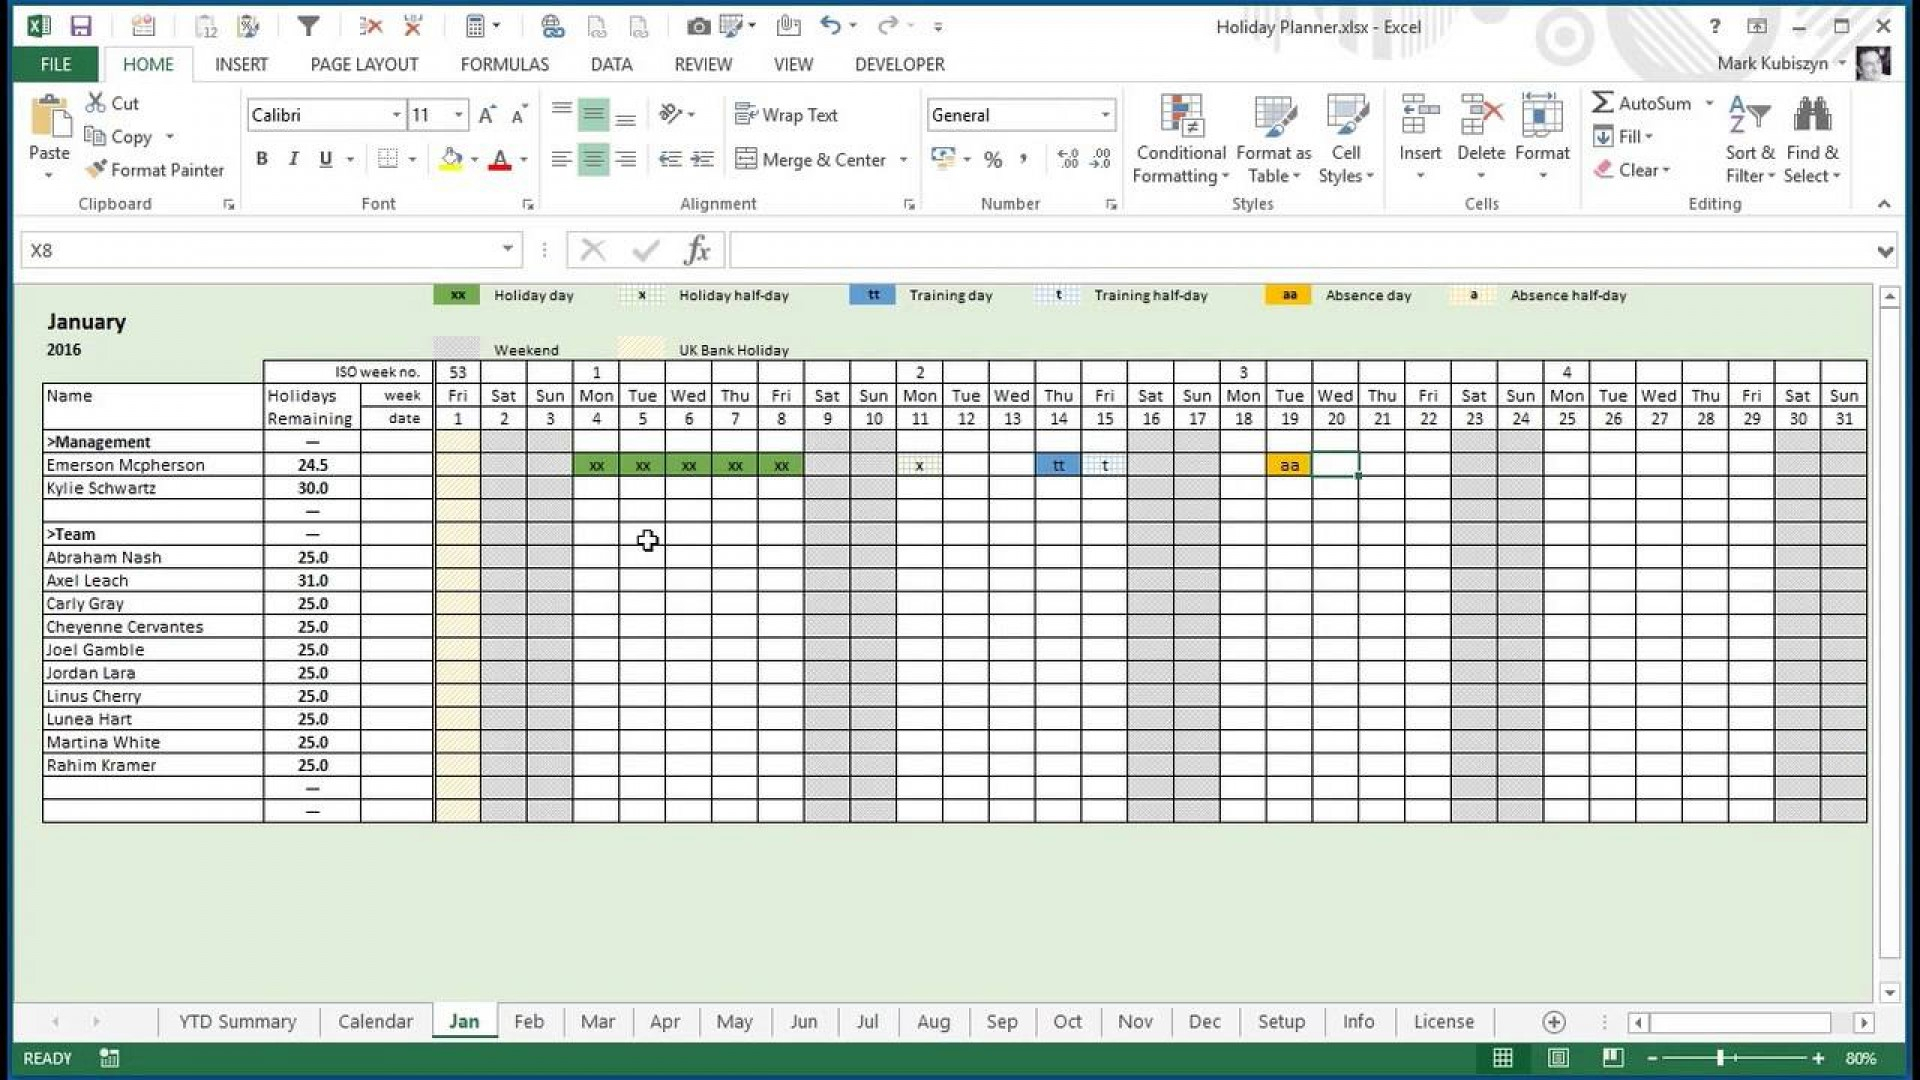 011 Holiday Planning Calendar Template Plan Templates Imposing inside Calendar Templates In Office 365